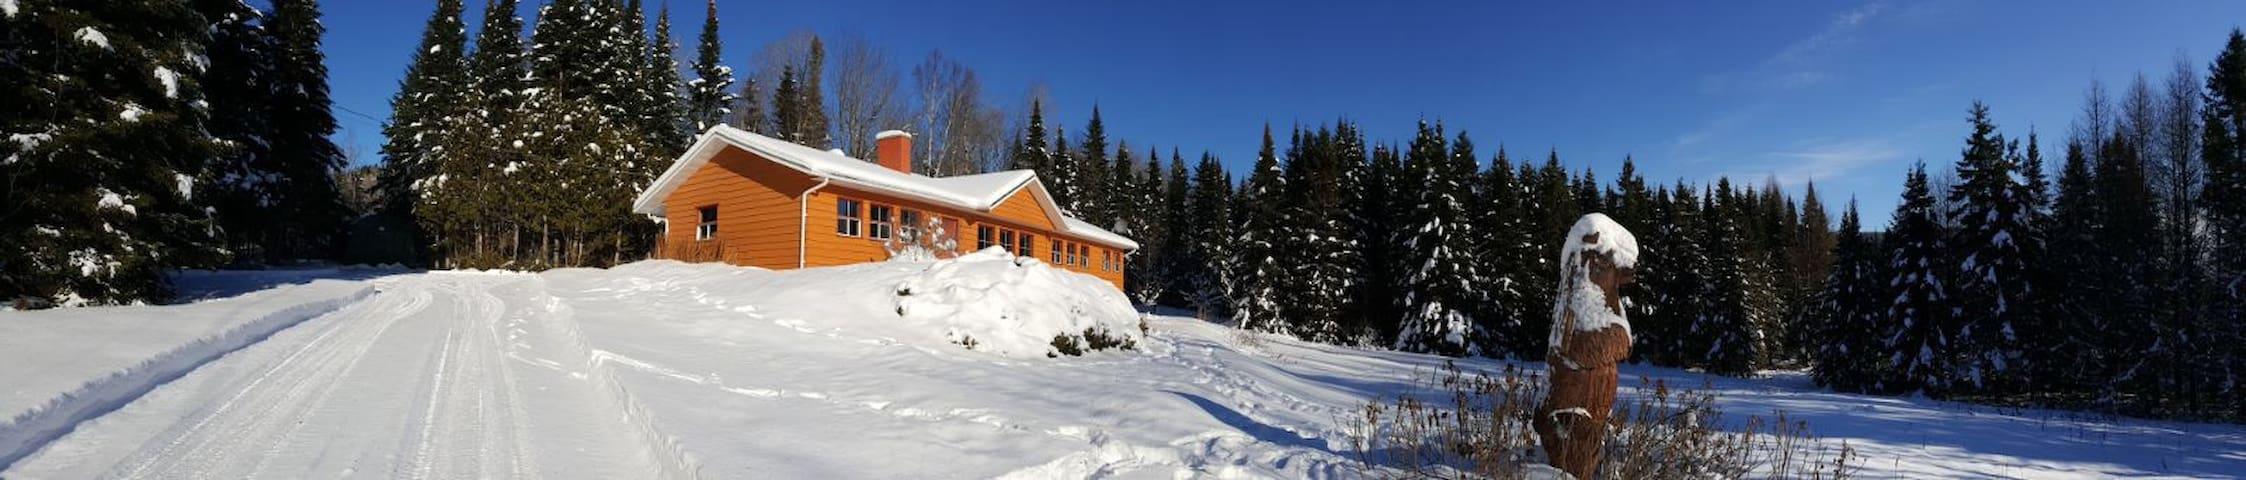 Saint-Joseph-de-Madawaska的民宿